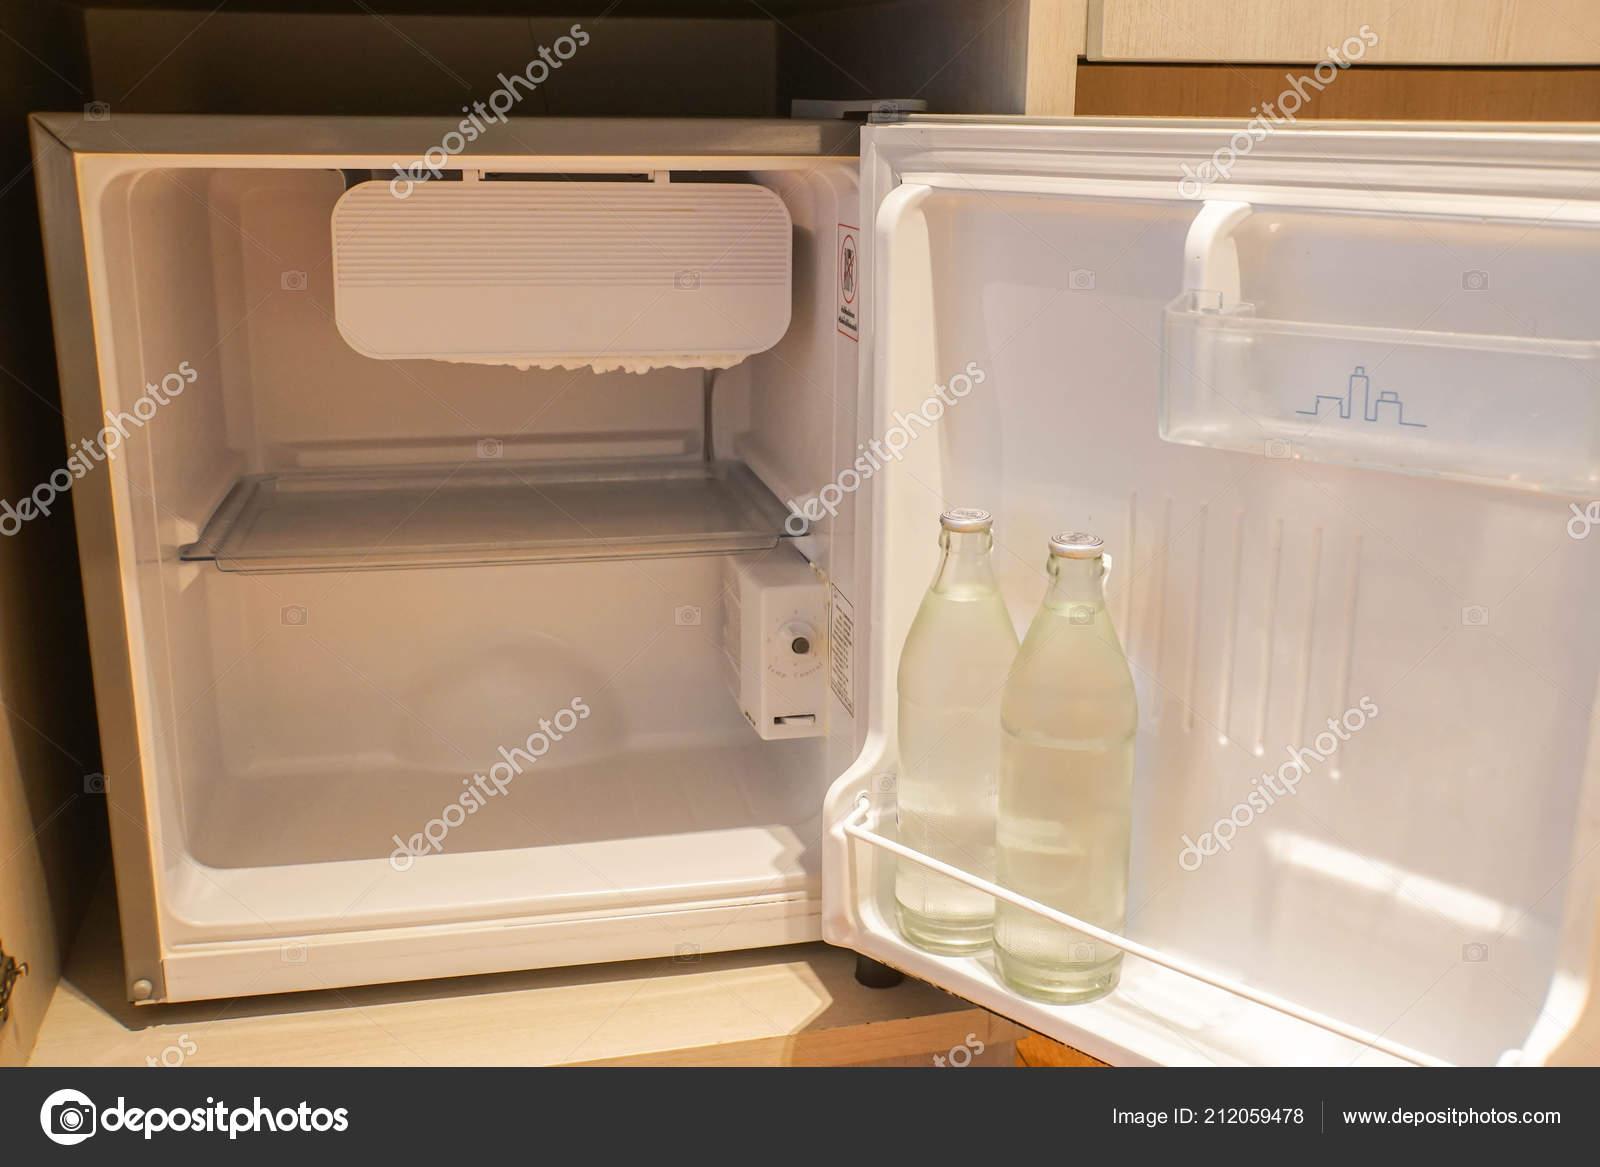 . Mini Fridge Hotel Bedroom Fresh Water Bottle   Stock Photo   Jummie